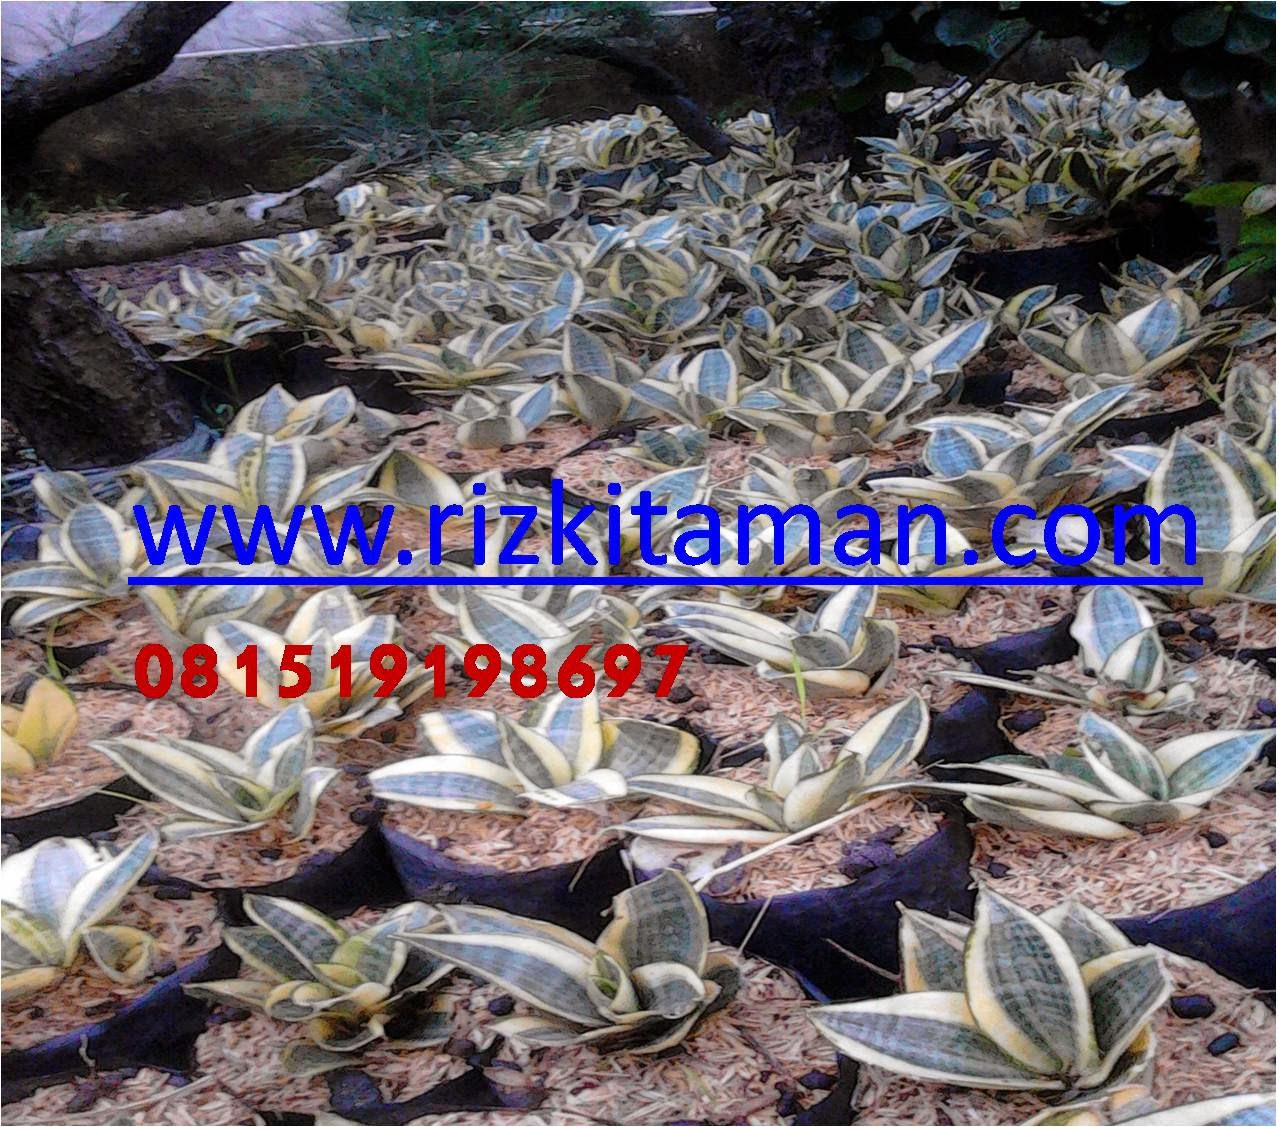 Jual Sansevieria hahni variegata | lidah mertua tapis kodok | suplier tanaman